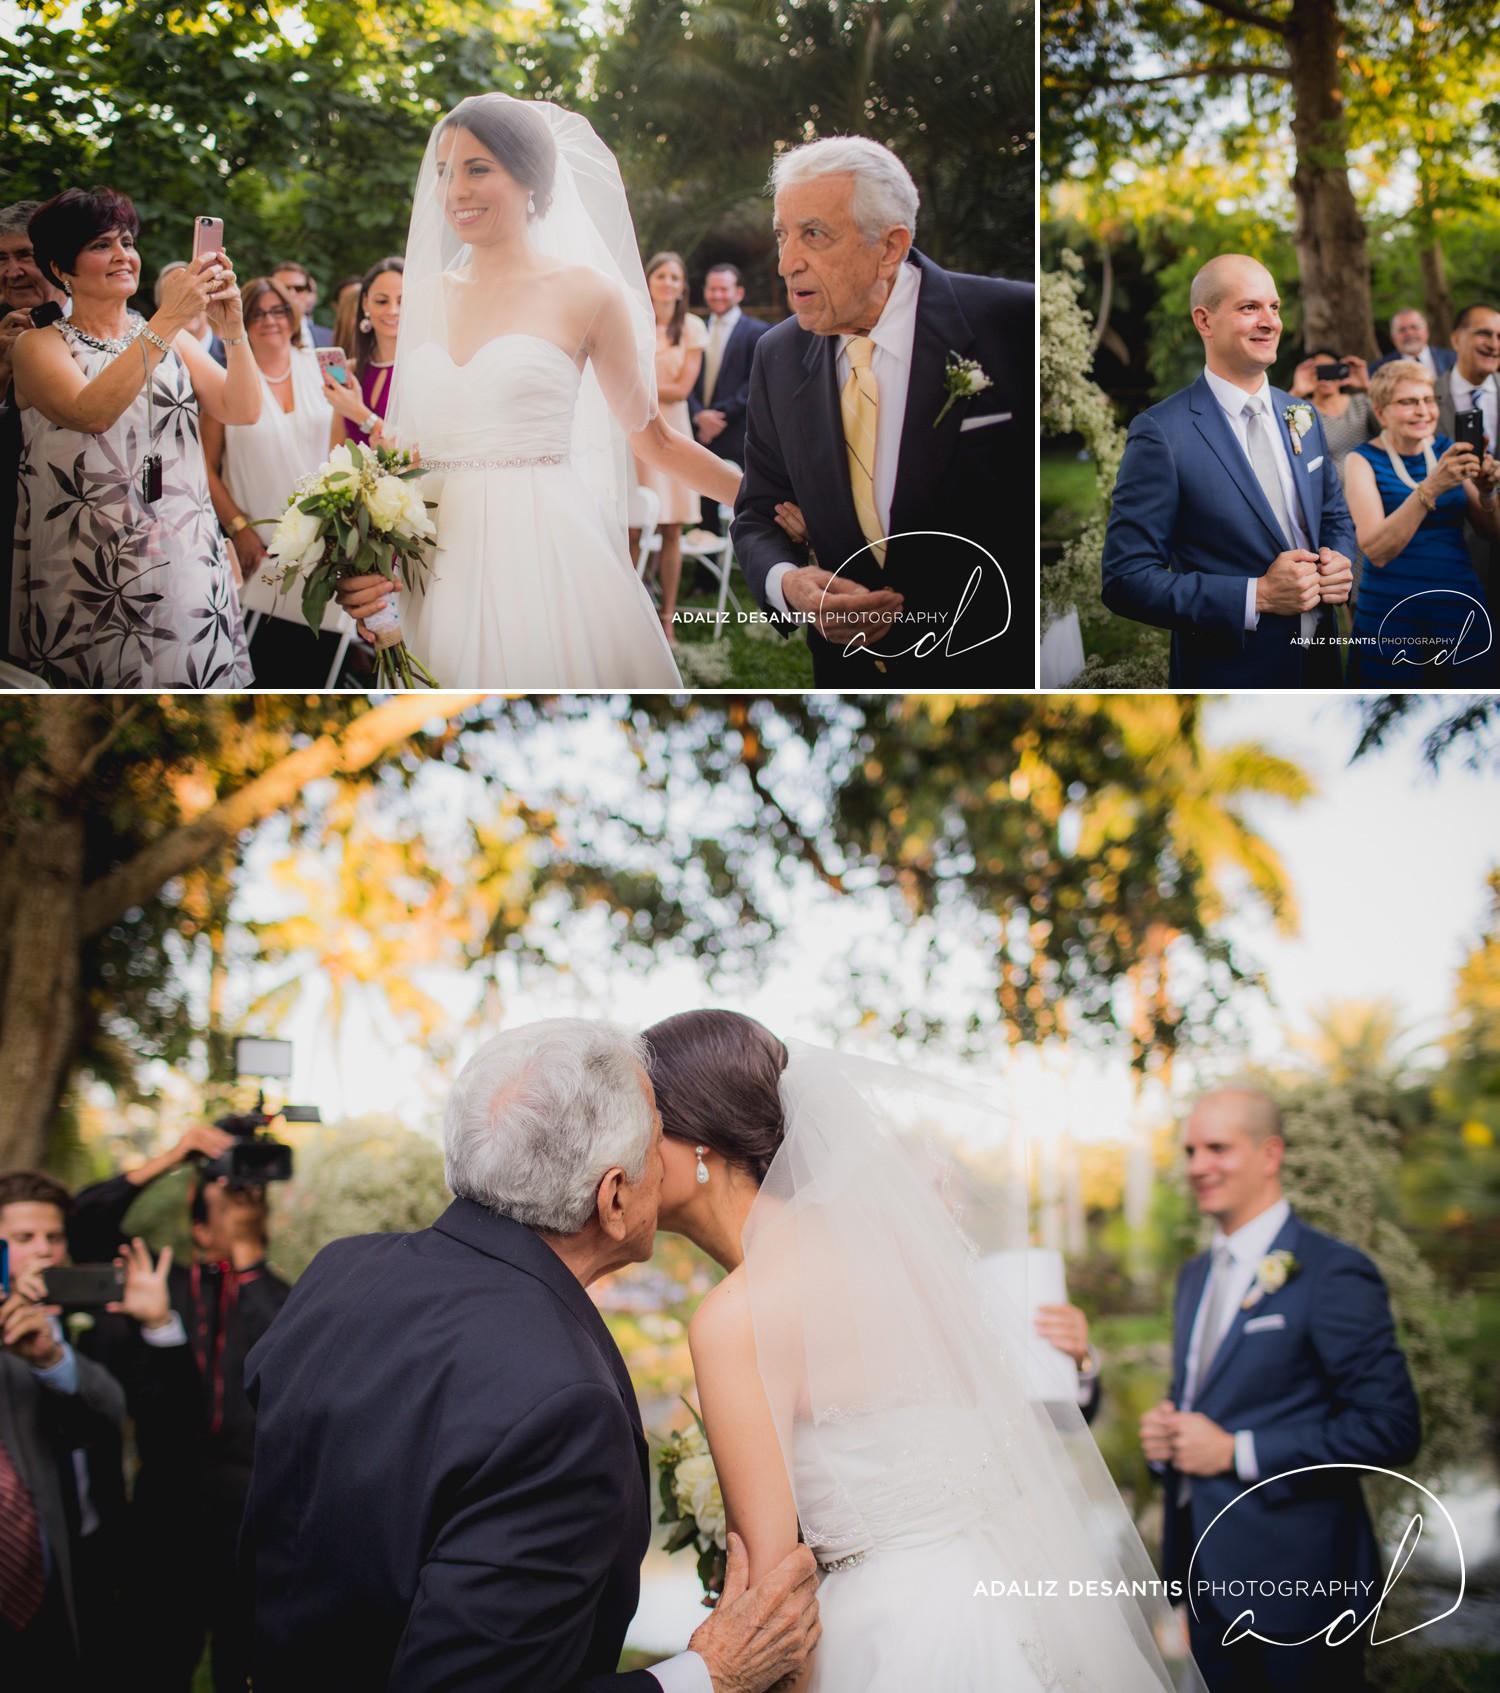 Southwest Ranches Le Chateau Davie FL Fort Lauderdale Garden Wedding 50.jpg